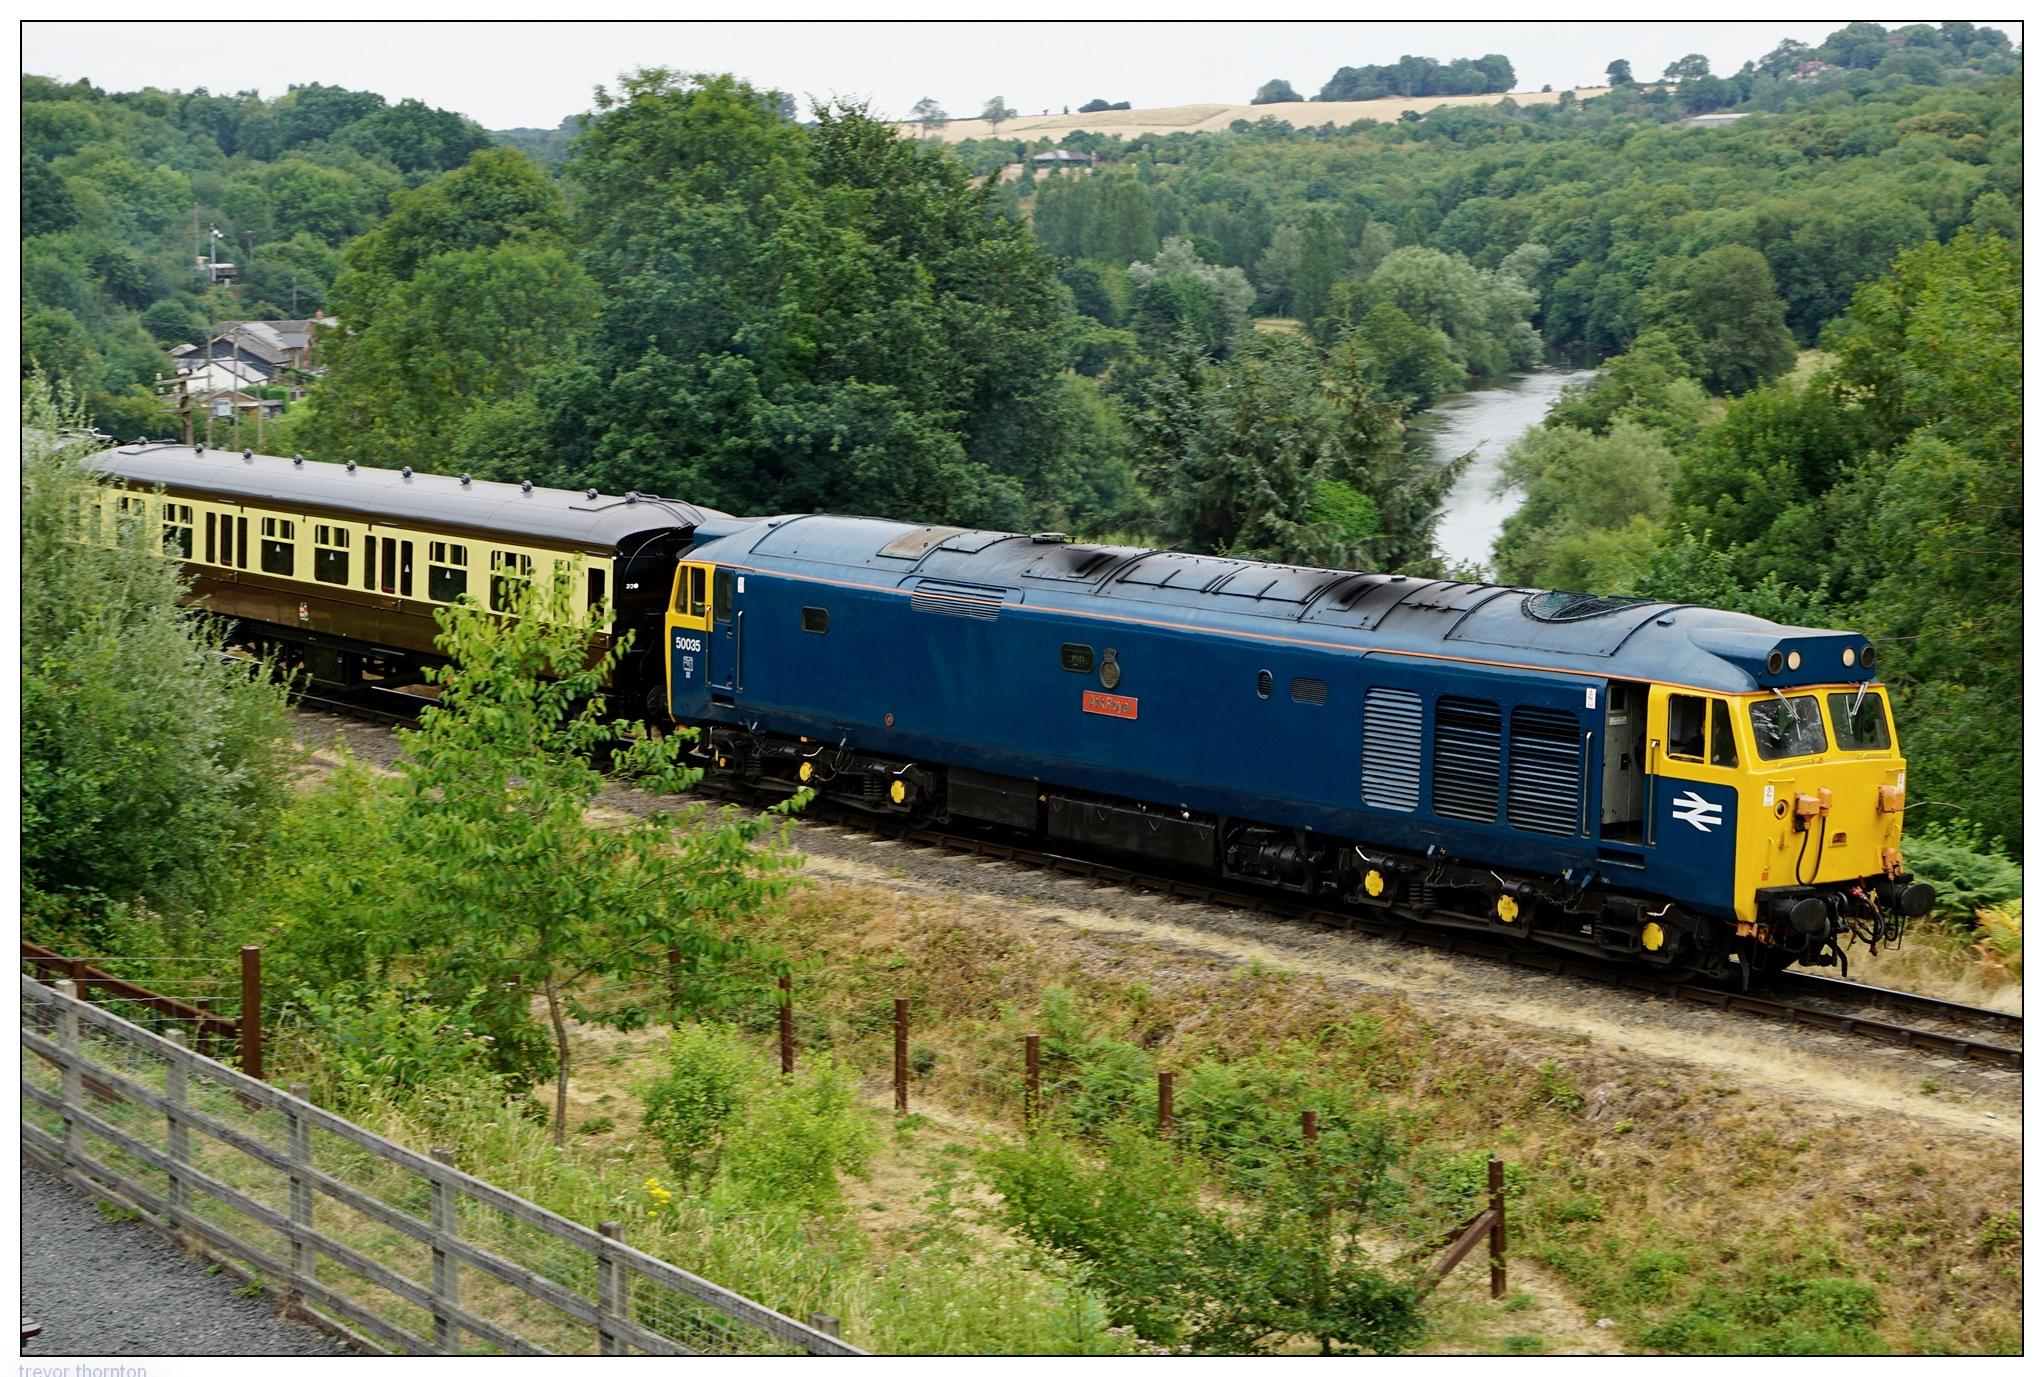 Severn Valley Railway by tpthornton